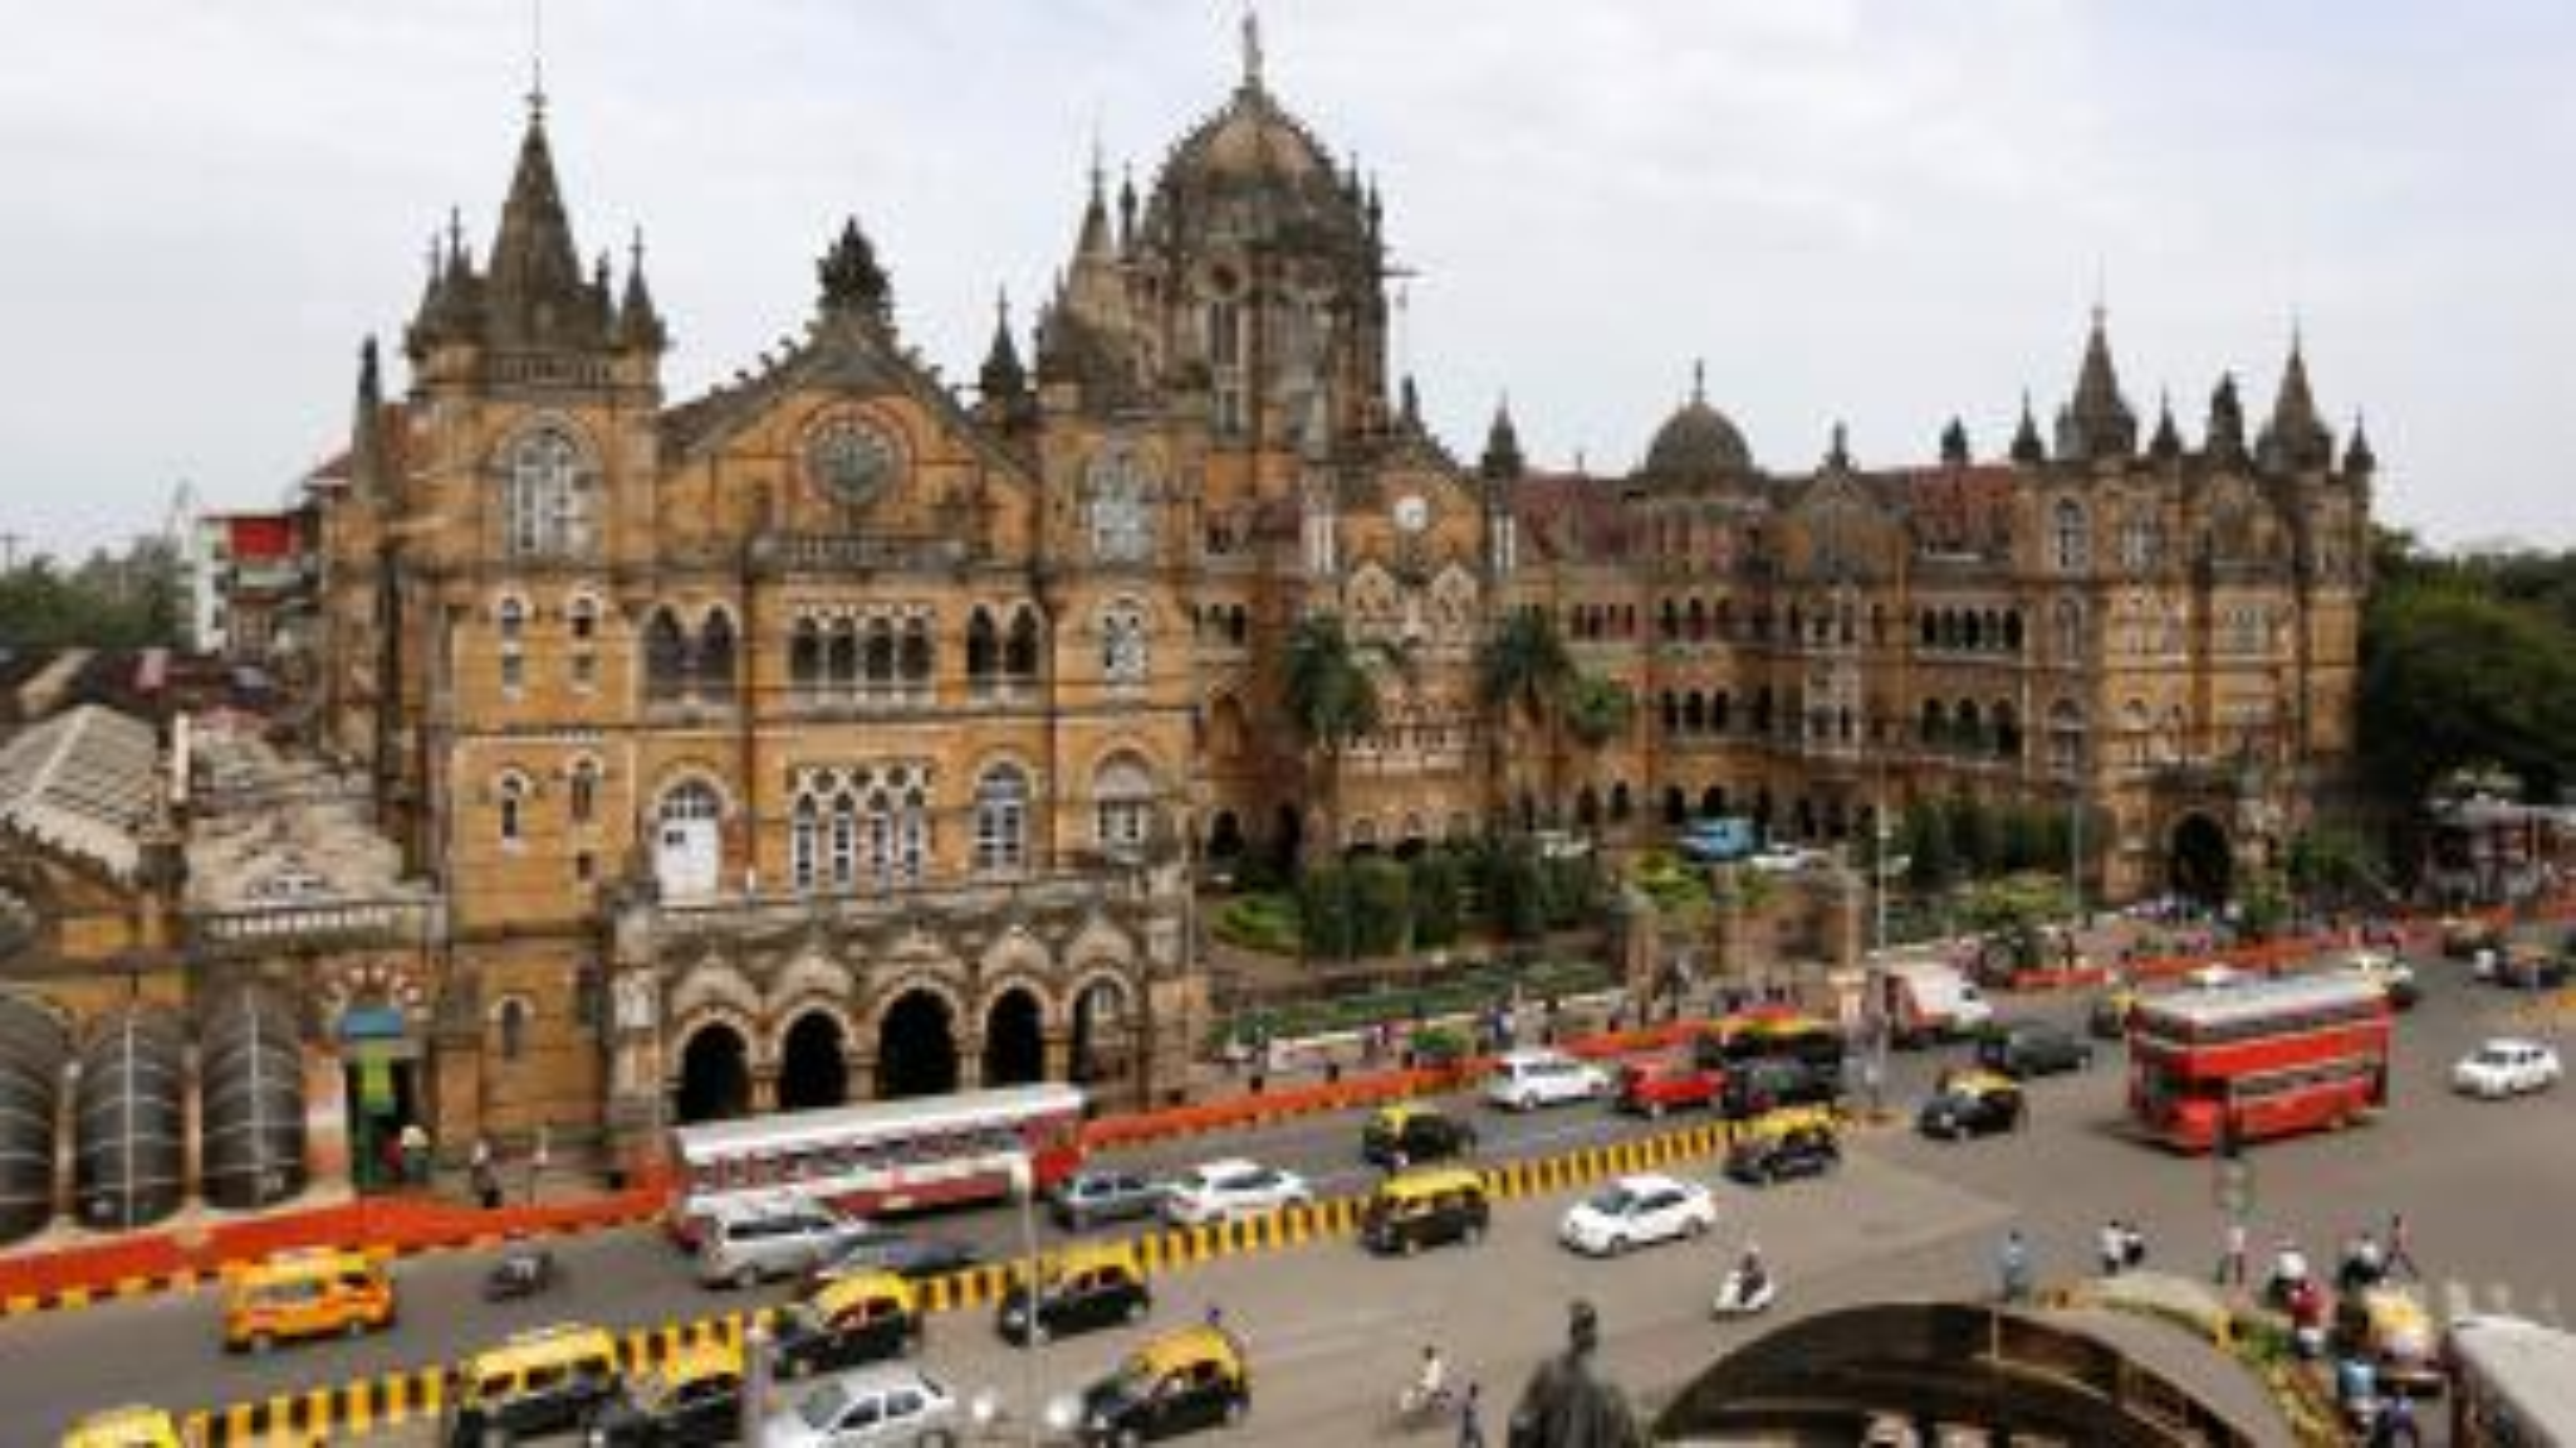 Traffic moves in front of the Chhatrapati Shivaji Terminus railway station in Mumbai